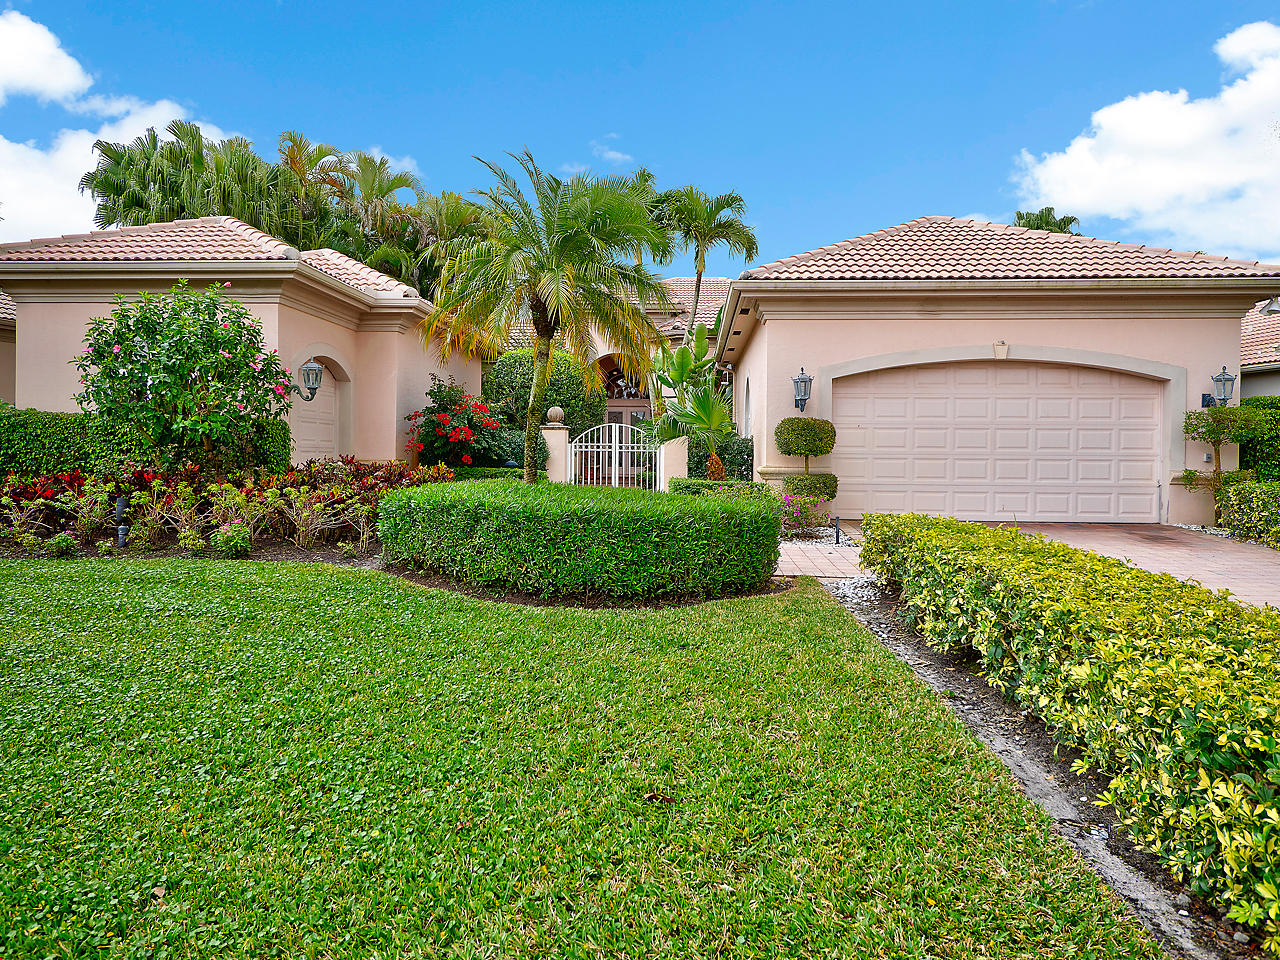 149 Vintage Isle Lane, Palm Beach Gardens, Florida 33418, 3 Bedrooms Bedrooms, ,5 BathroomsBathrooms,A,Single family,Vintage Isle,RX-10499362